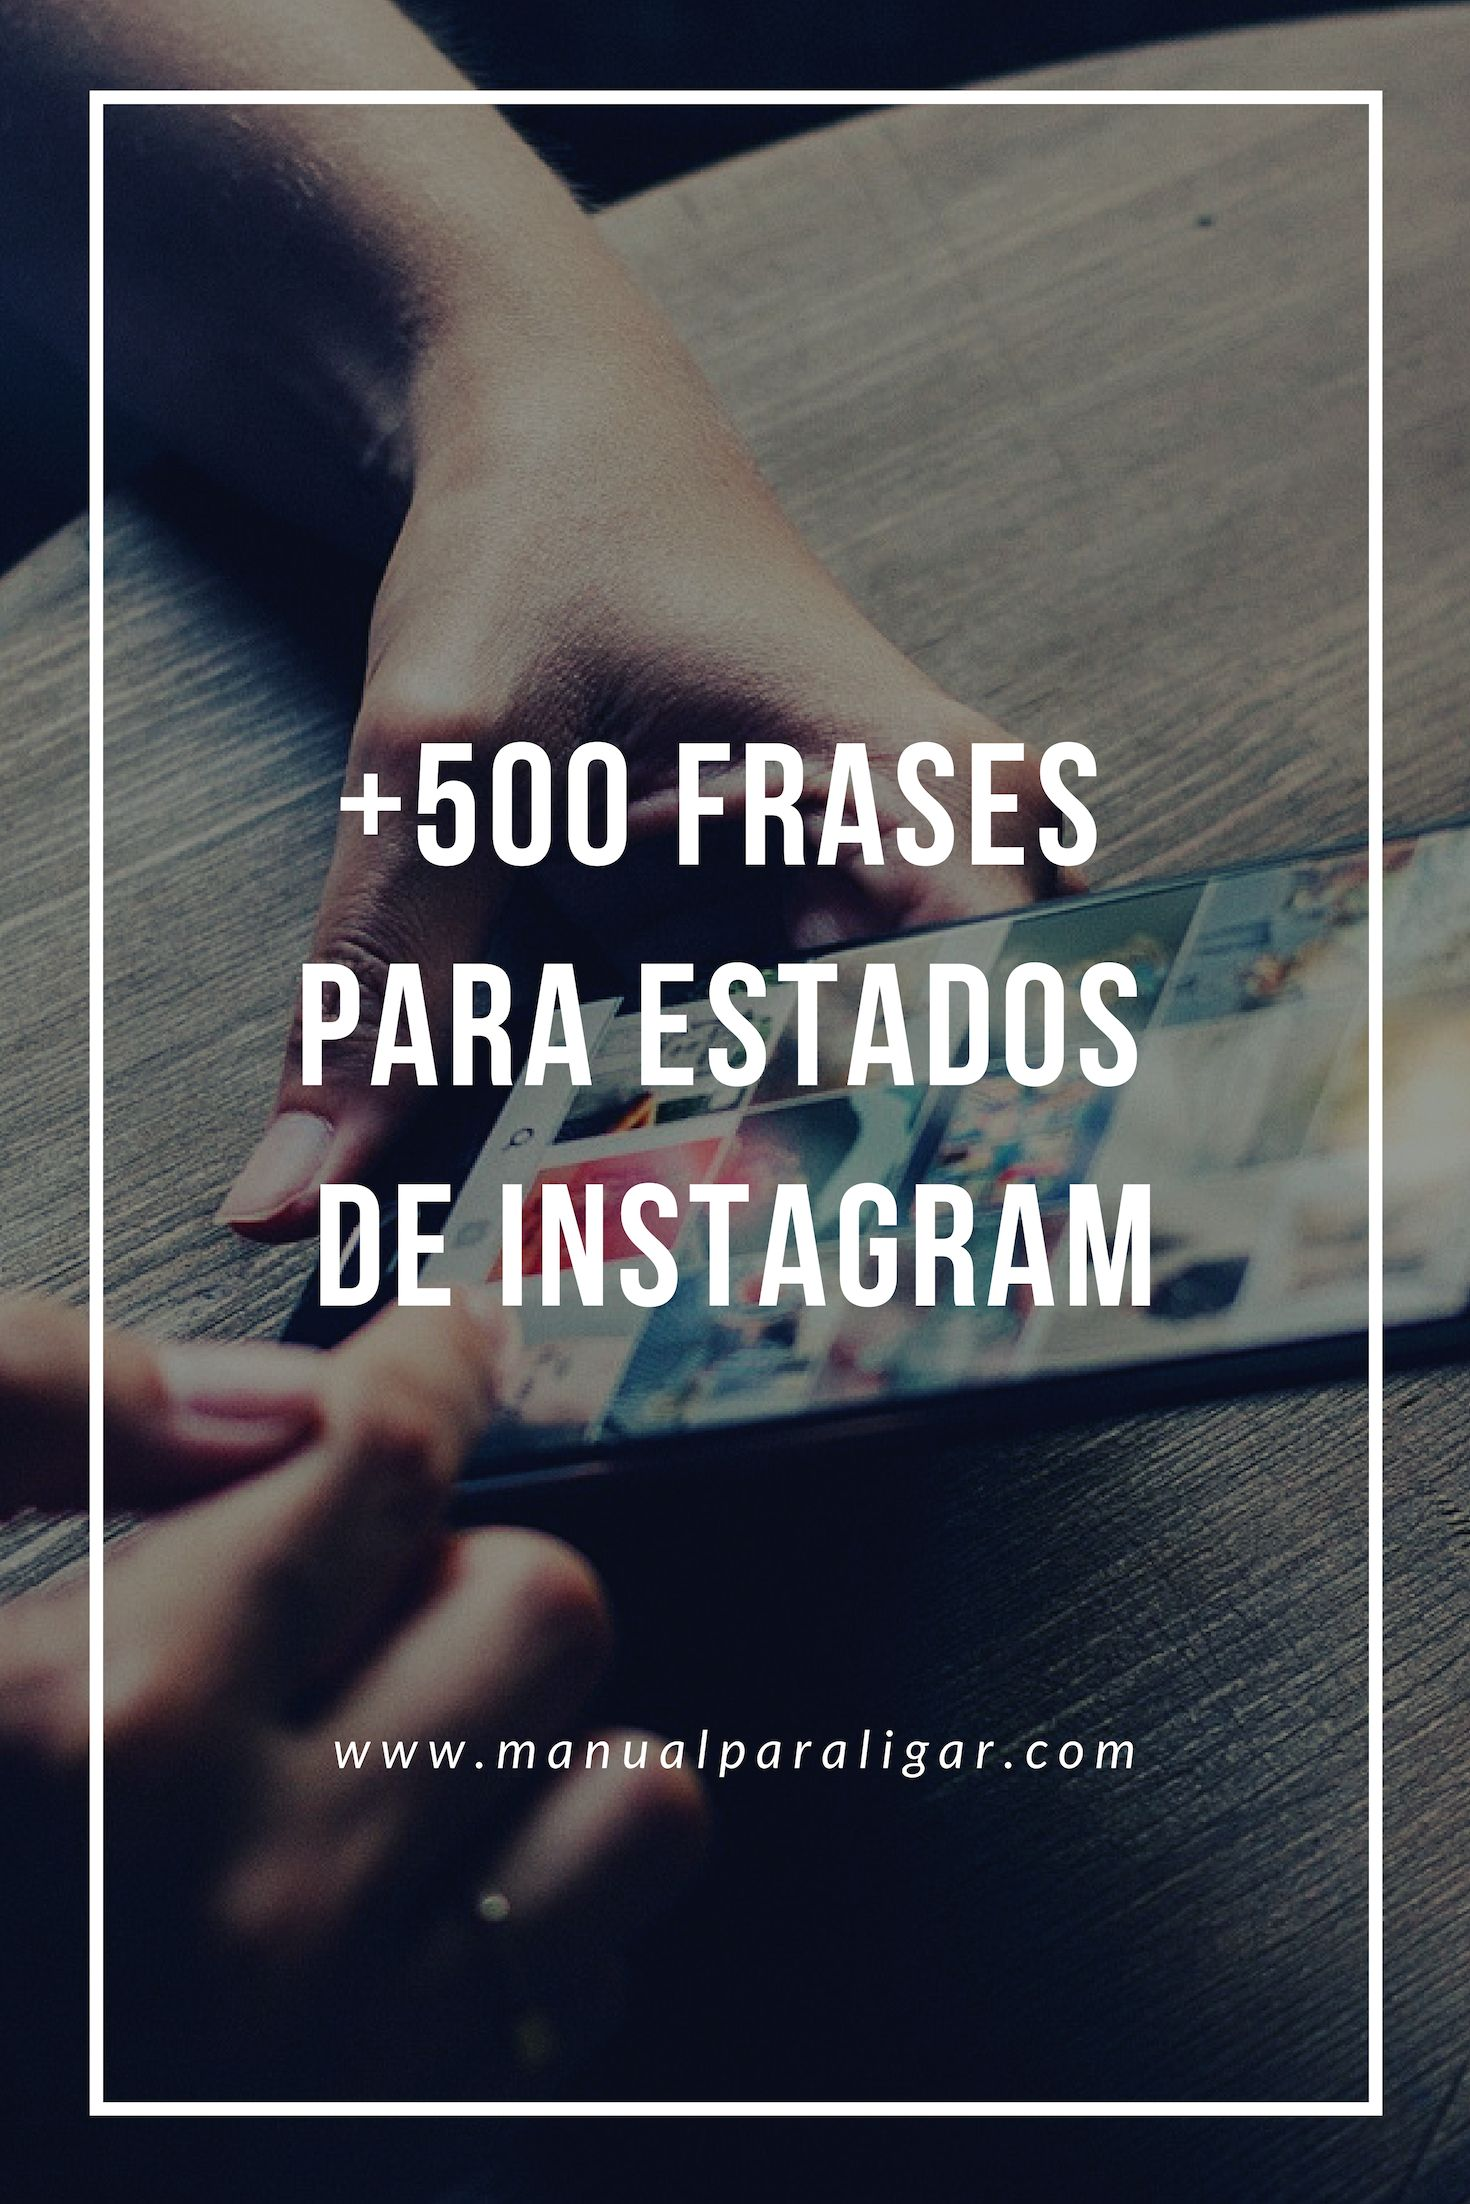 500 Frases Para Estados De Instagram Métodos Para Ligar Instagram Bio Instagram Photo